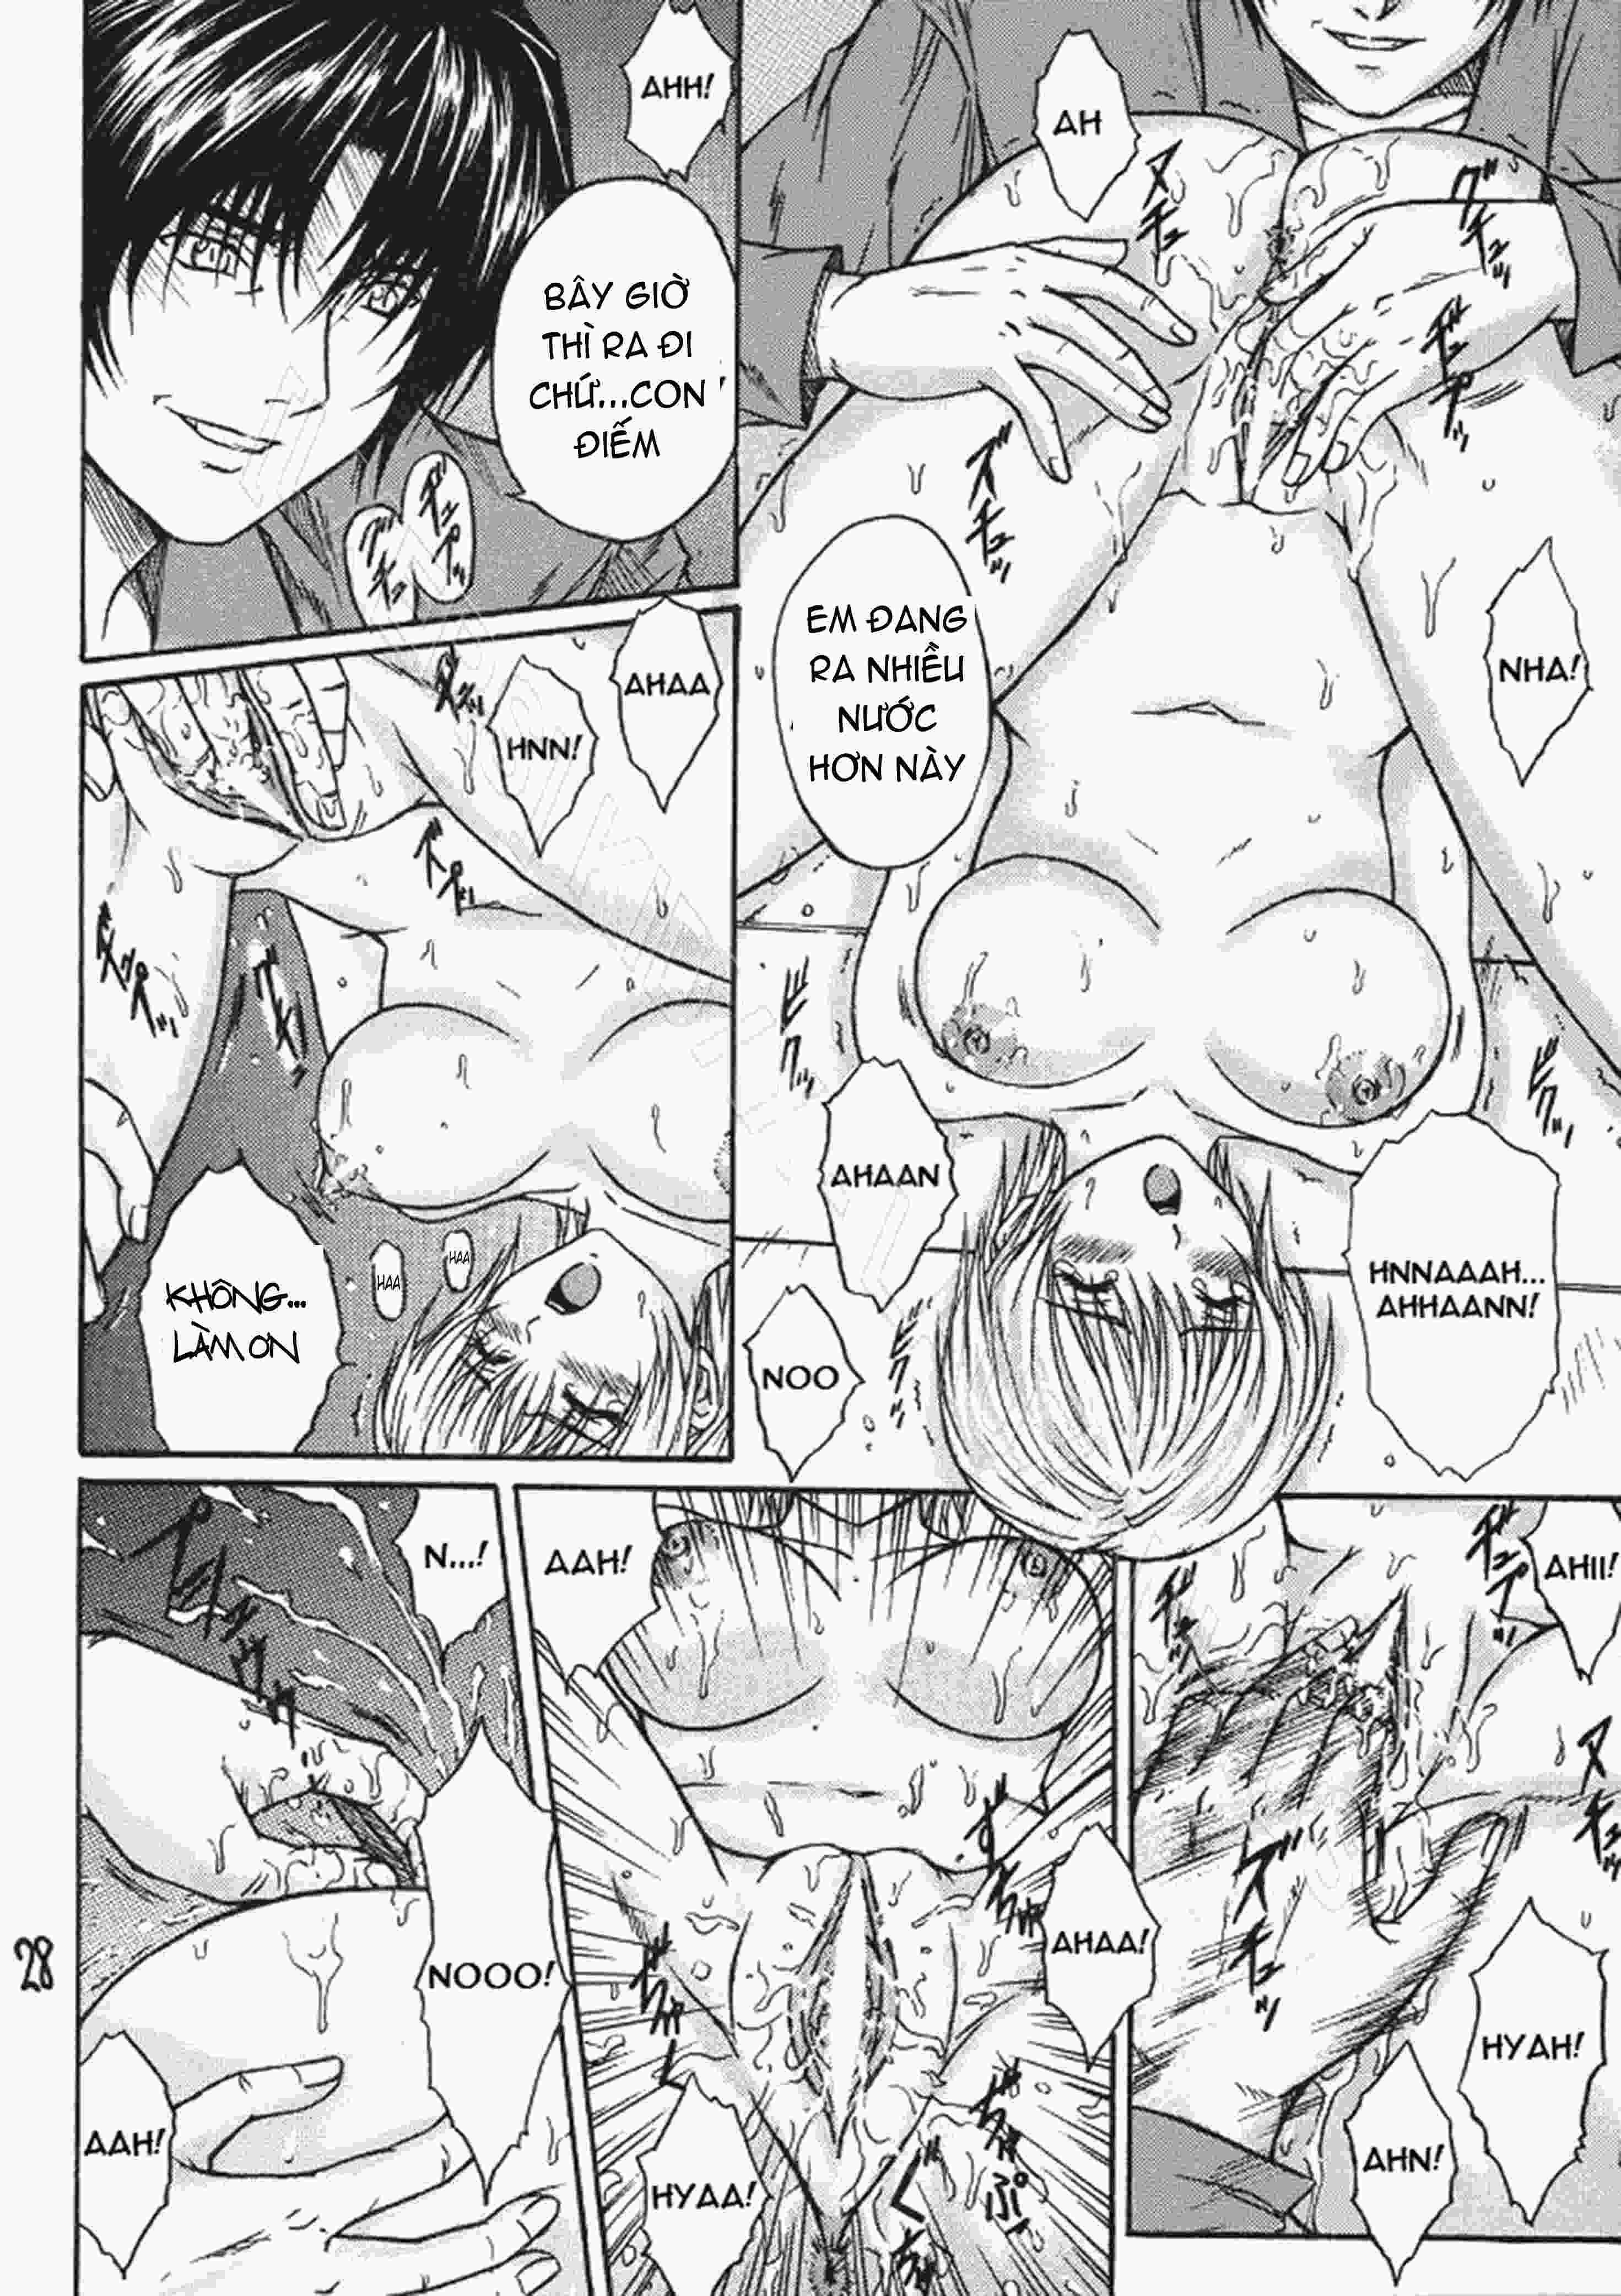 TruyenHay.Com - Ảnh 27 - Ryoujoku Rensa Chapter 3